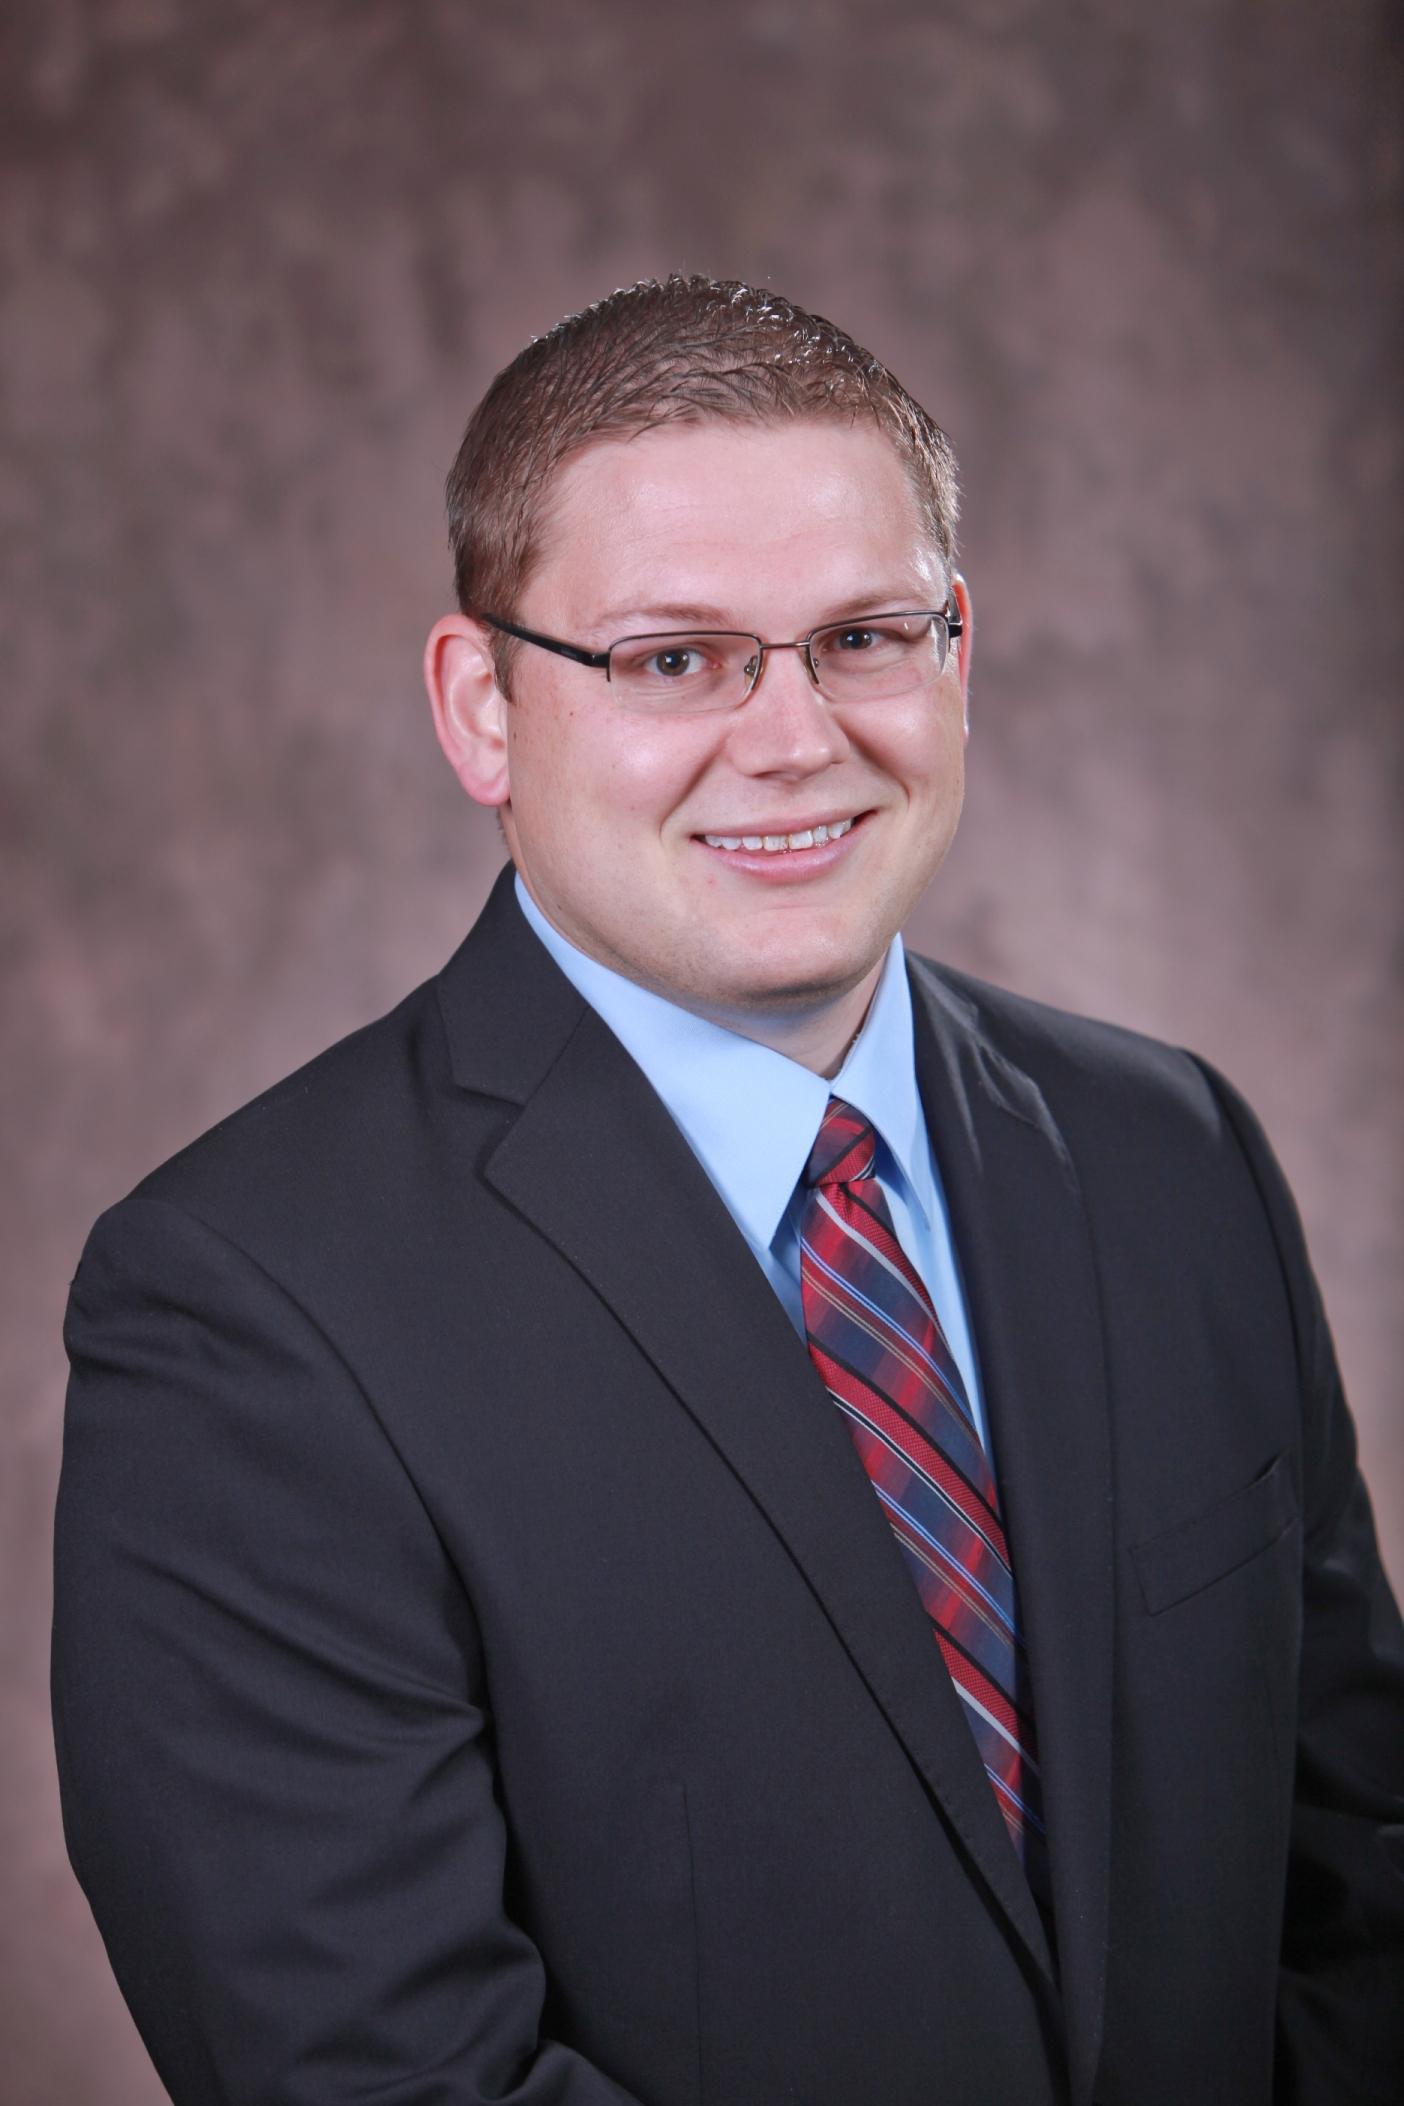 Personal injury attorney Brennan Delaney